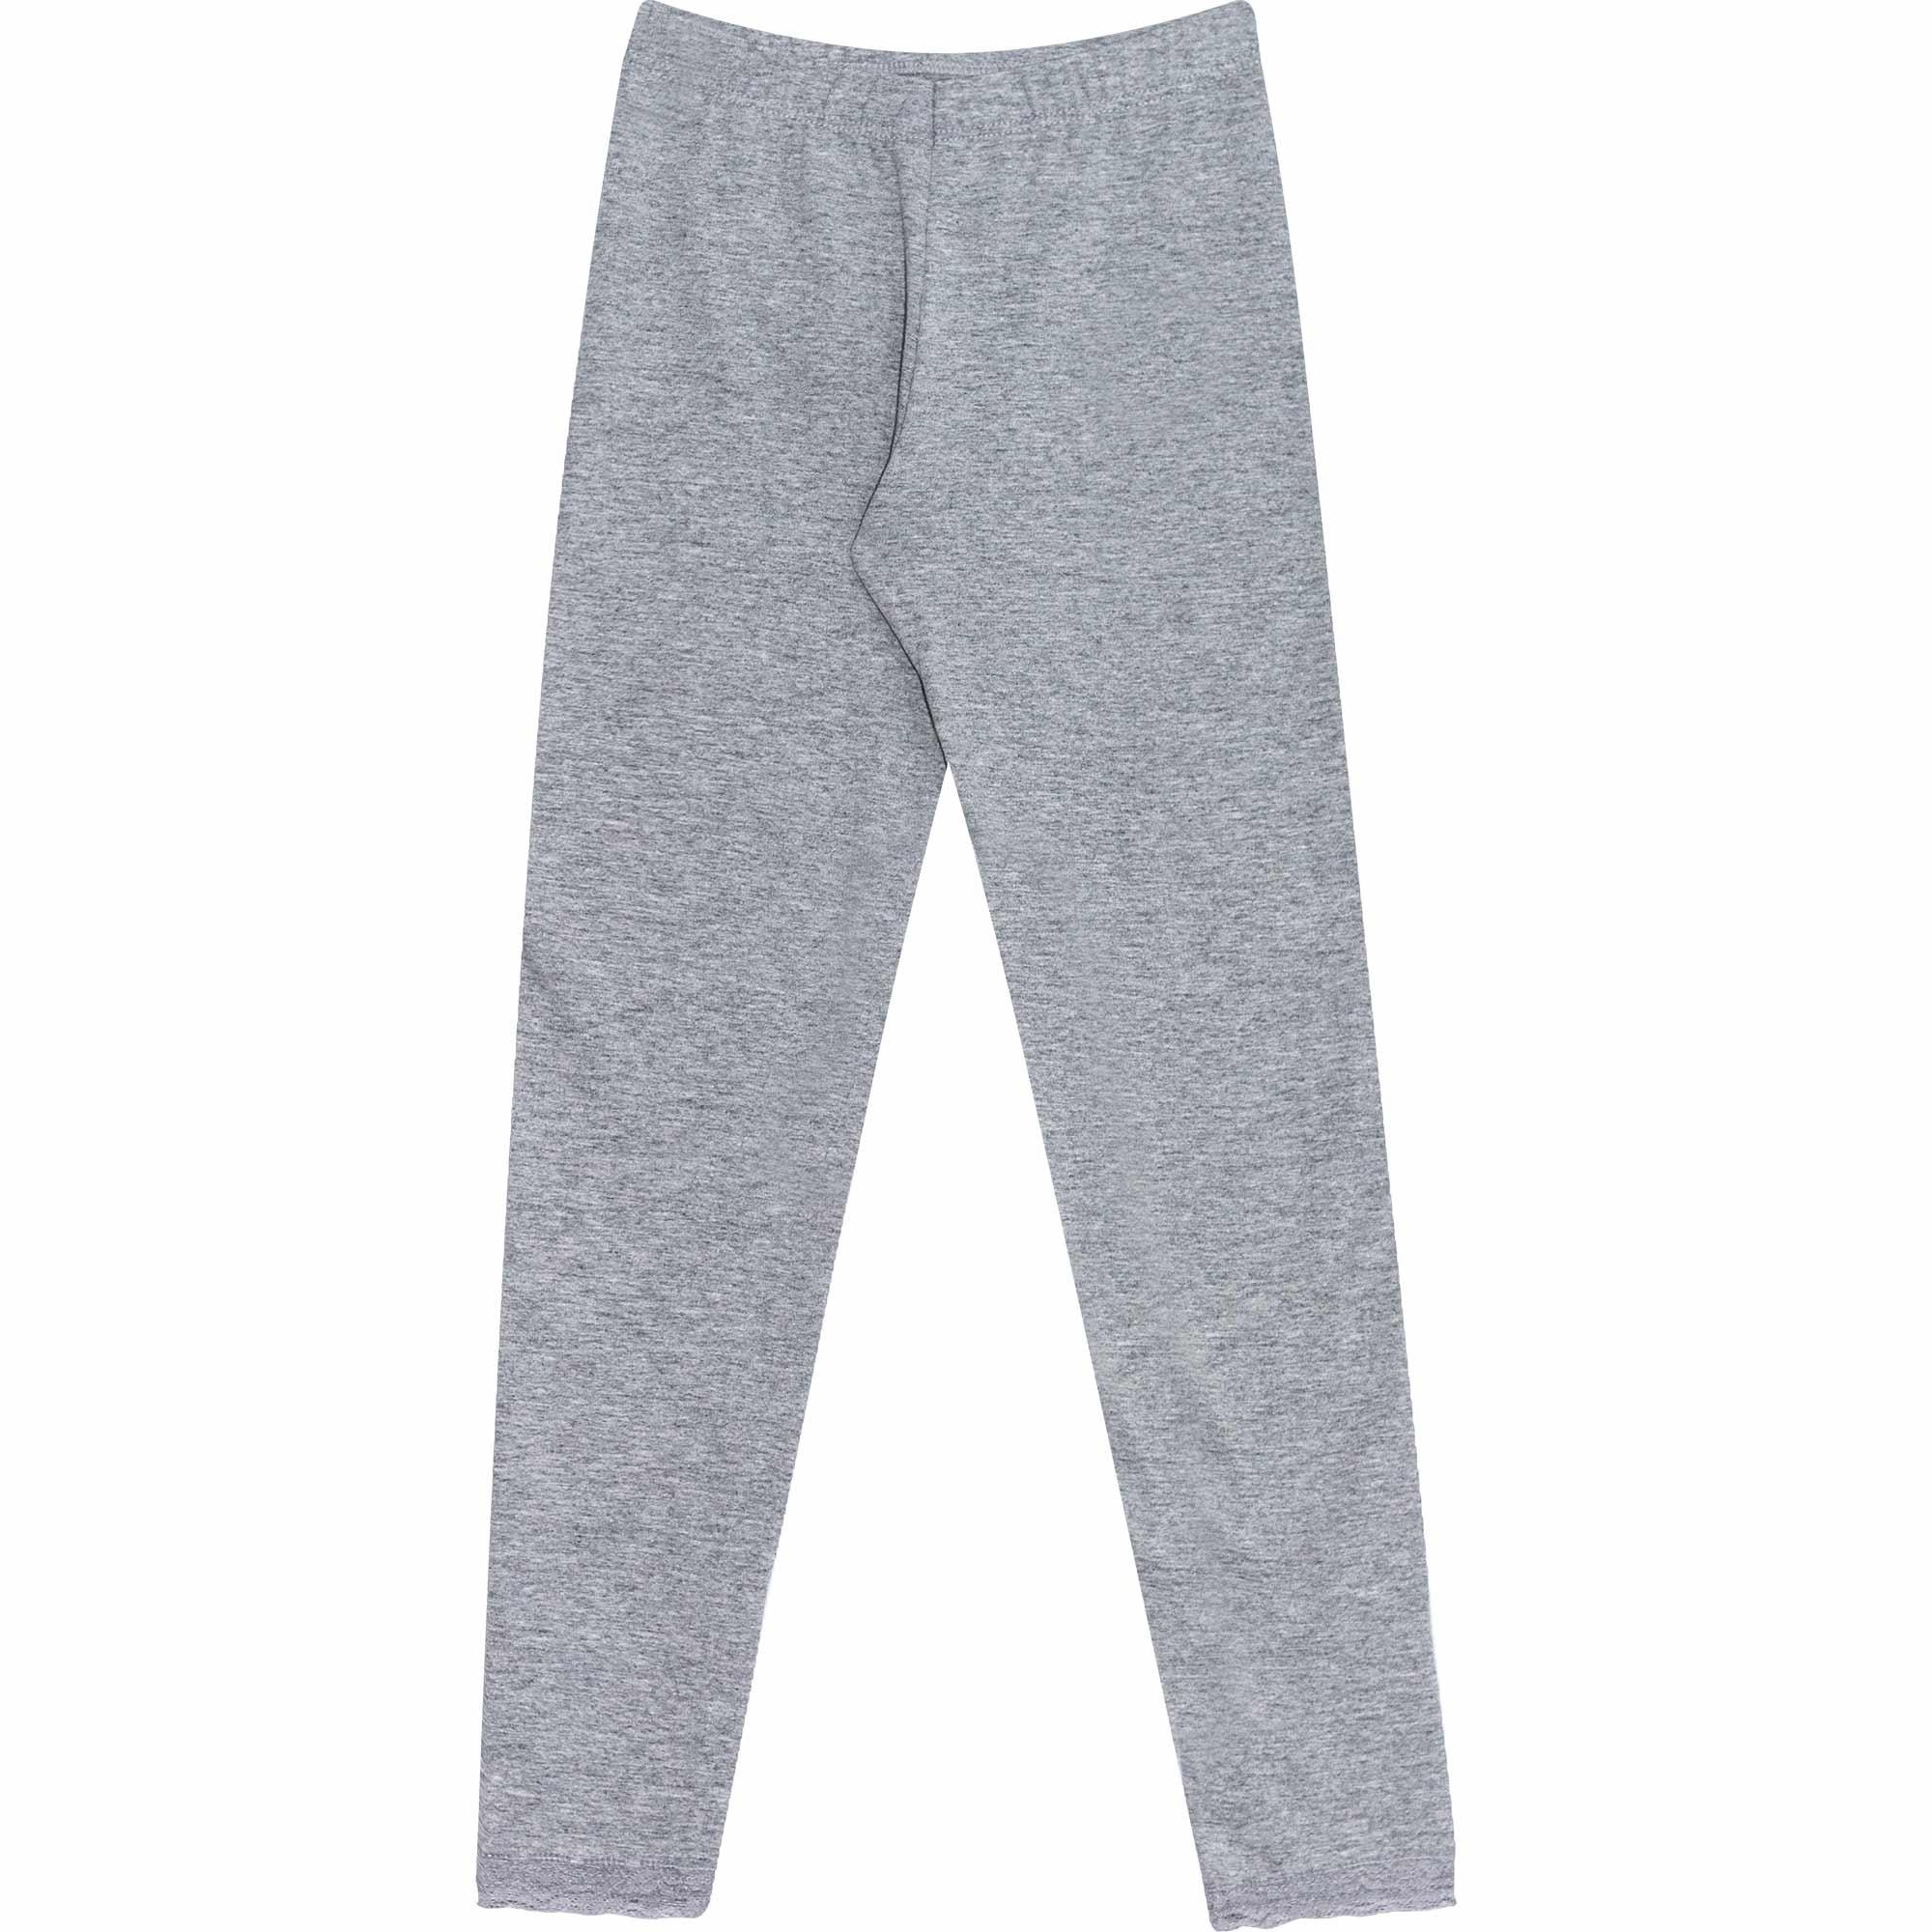 Calça Legging em Cotton com Renda - Ref 3018 - Mescla - Andritex